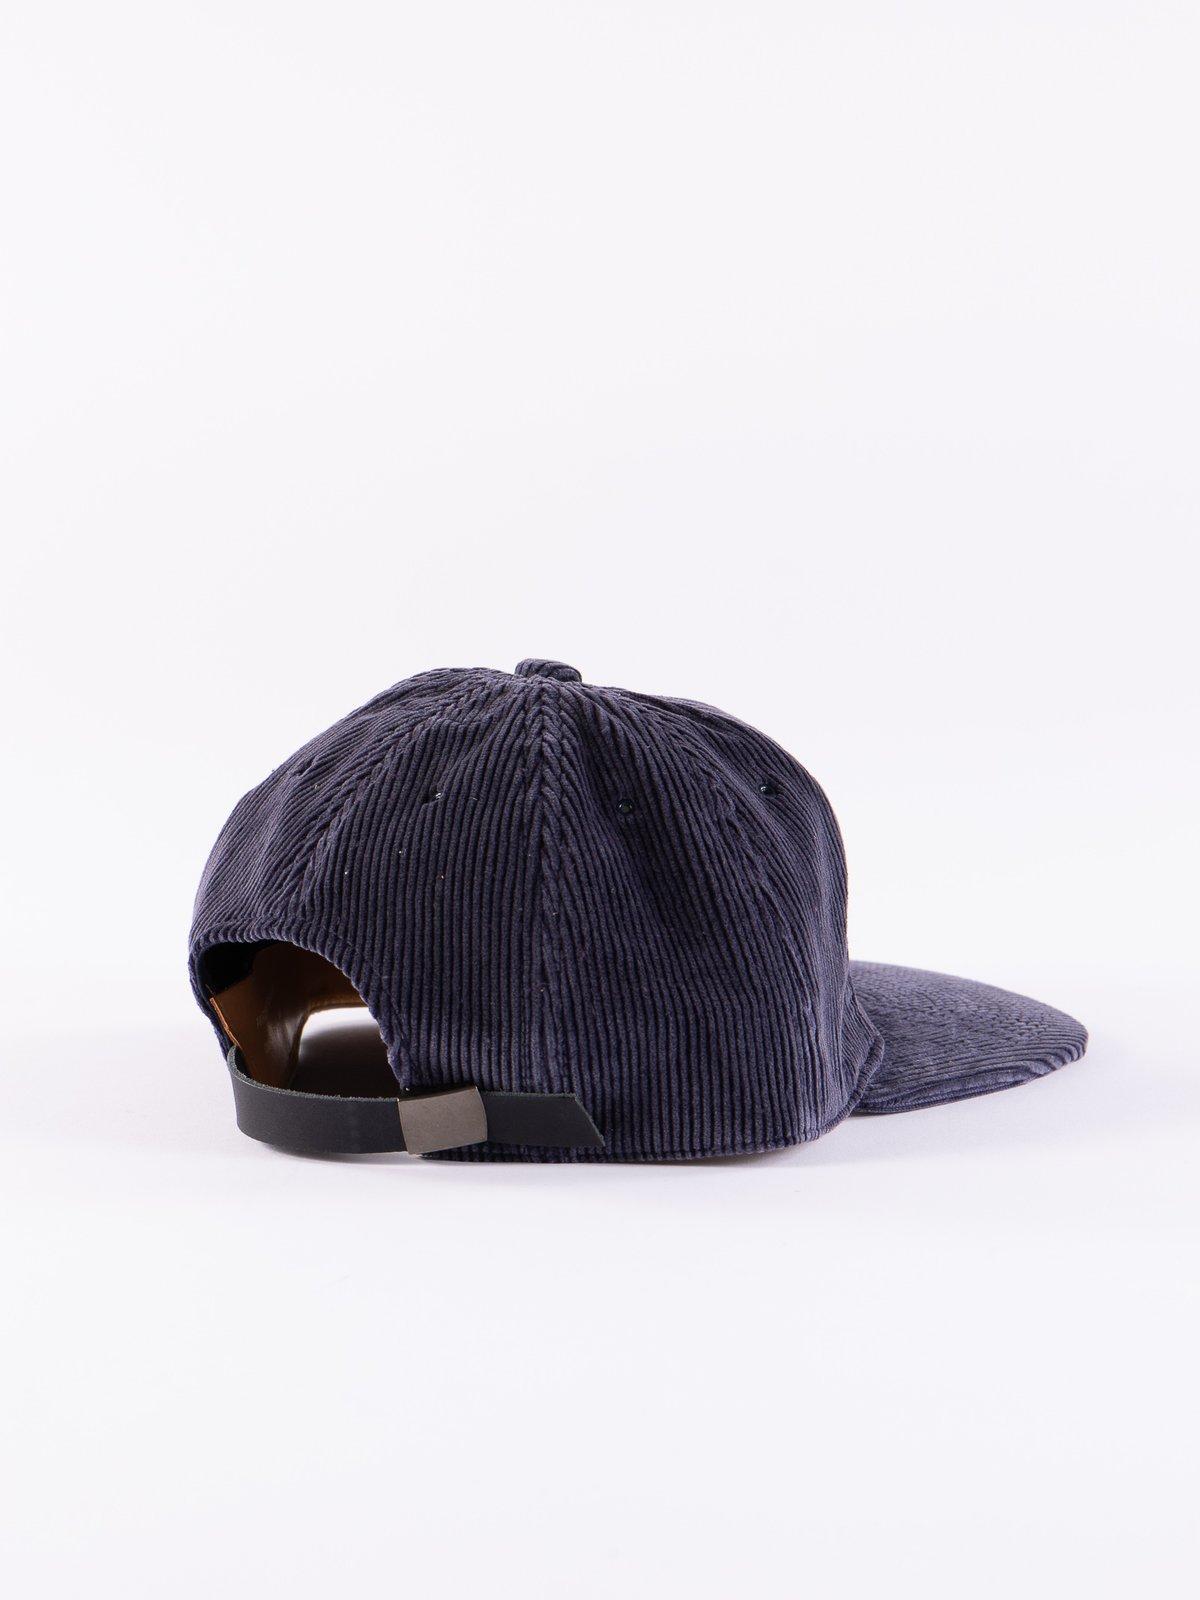 Navy Cole Cap - Image 2